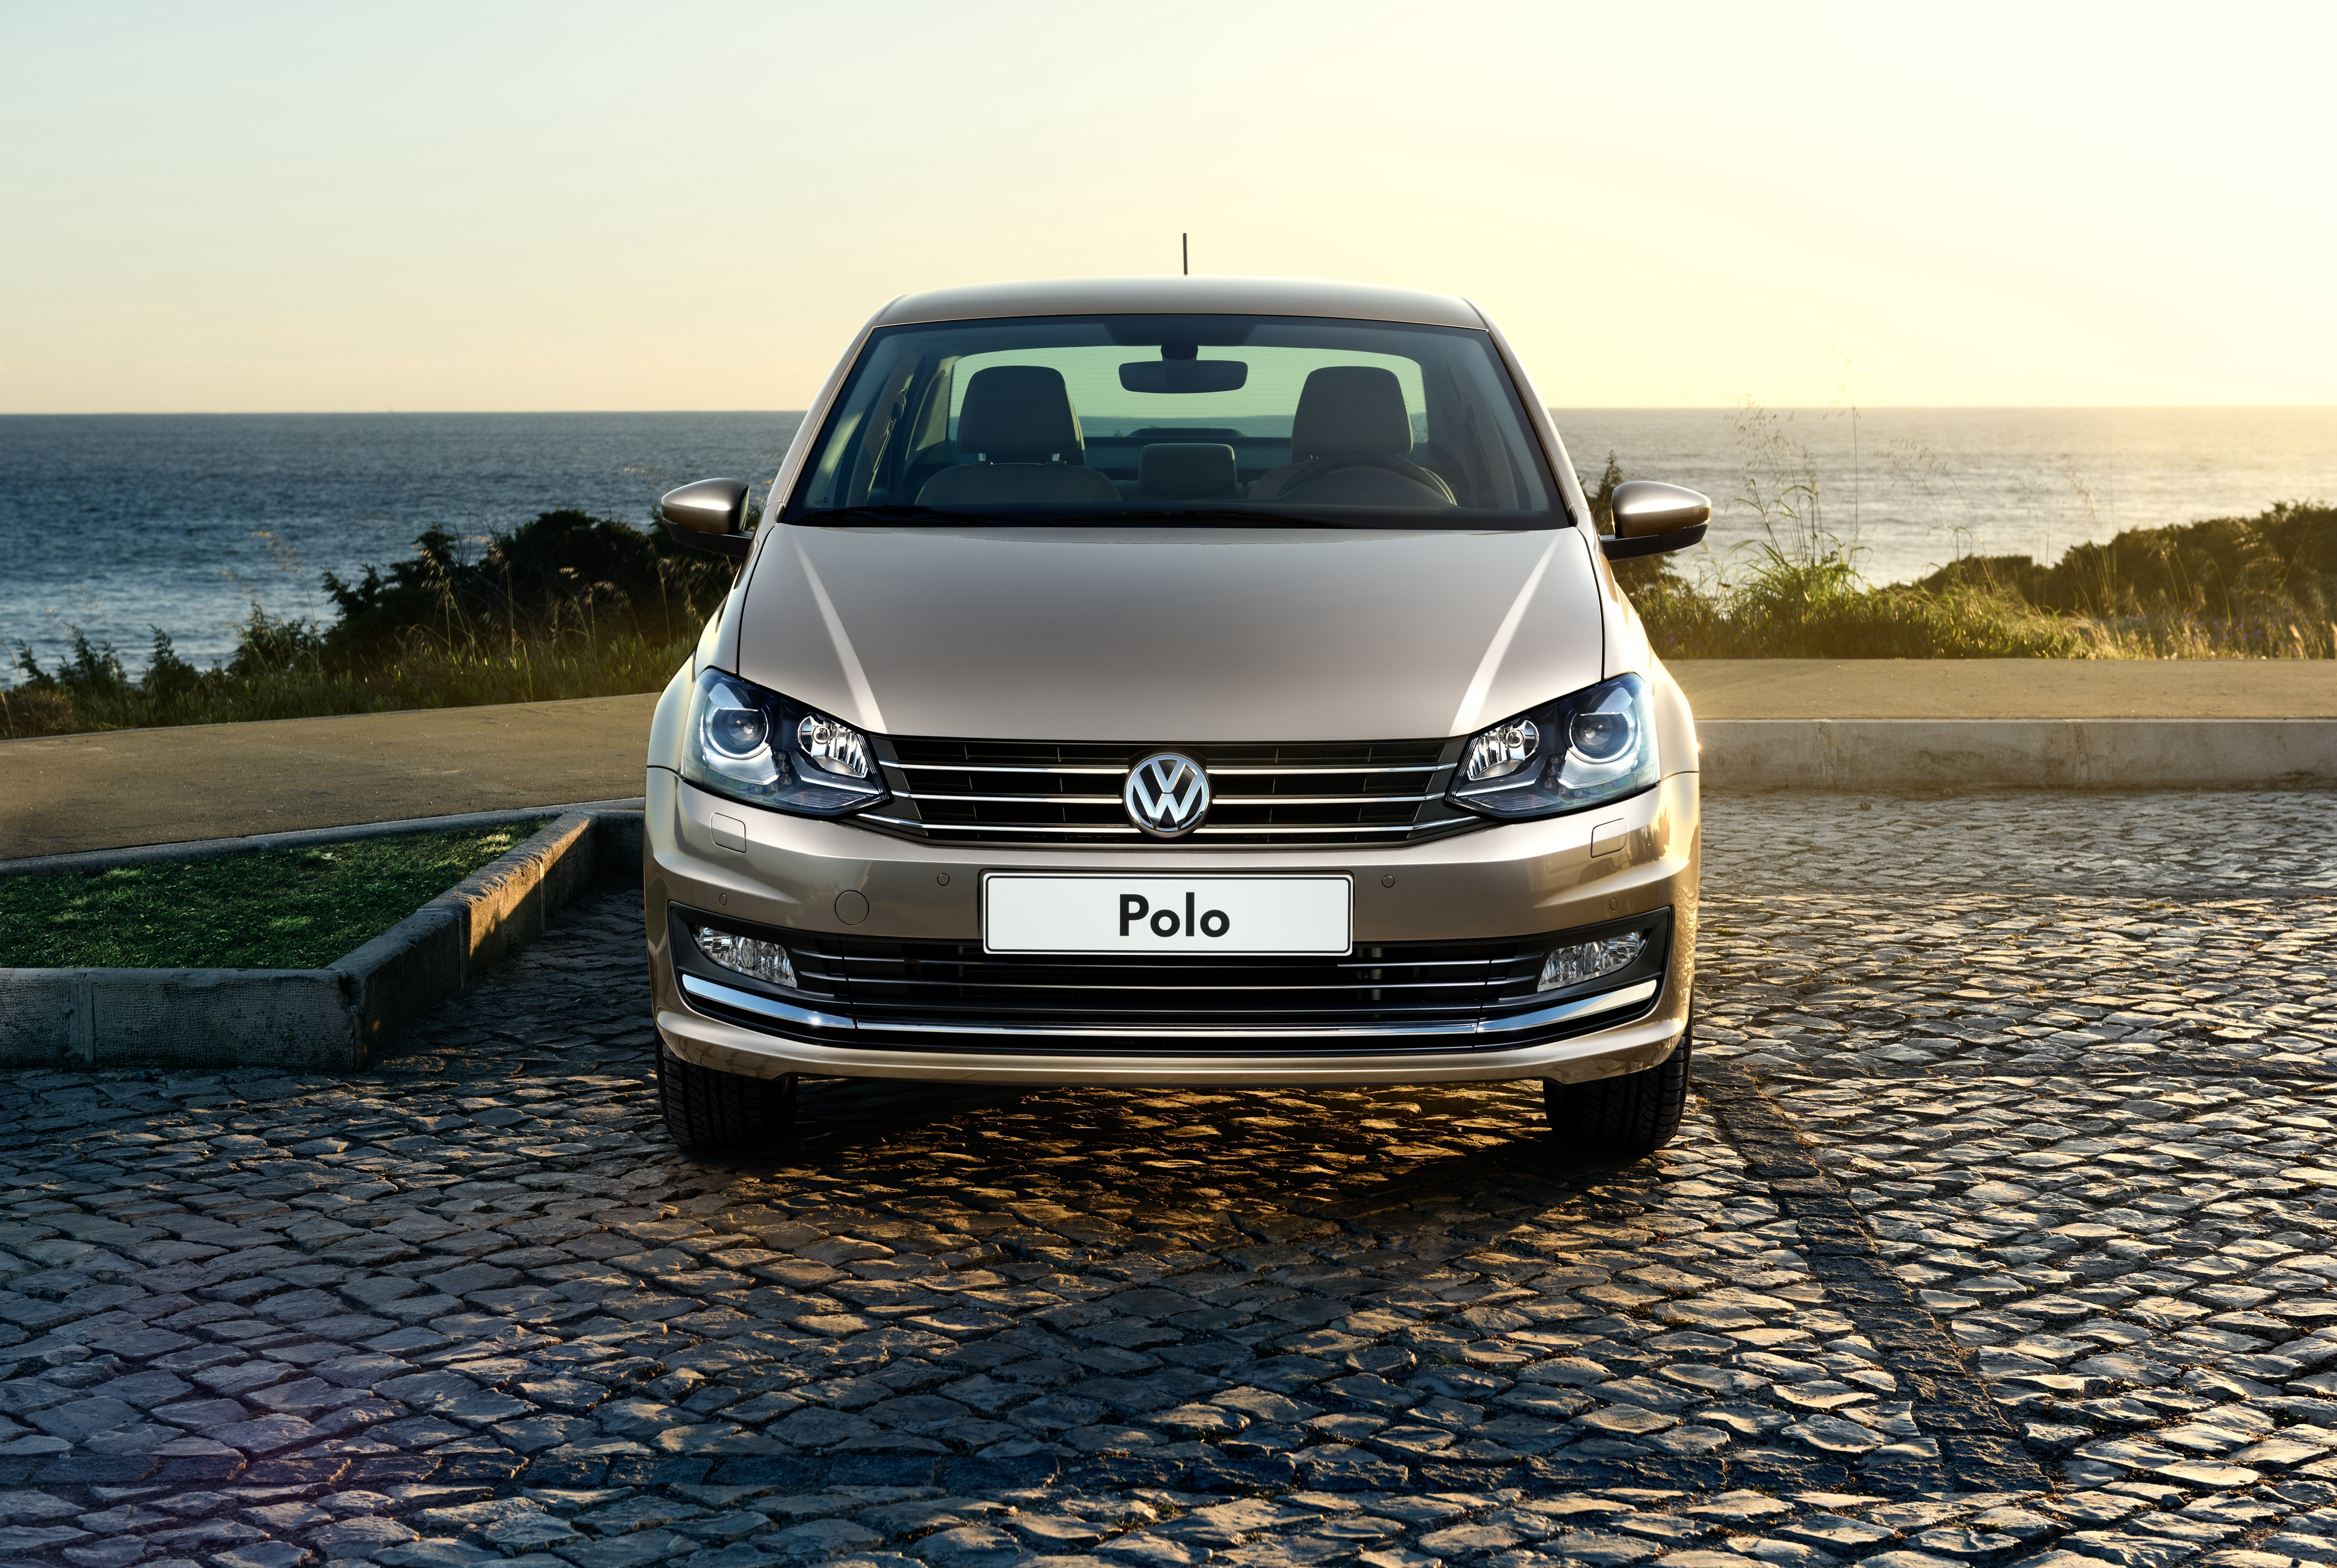 Volkswagen Polo Full Hd